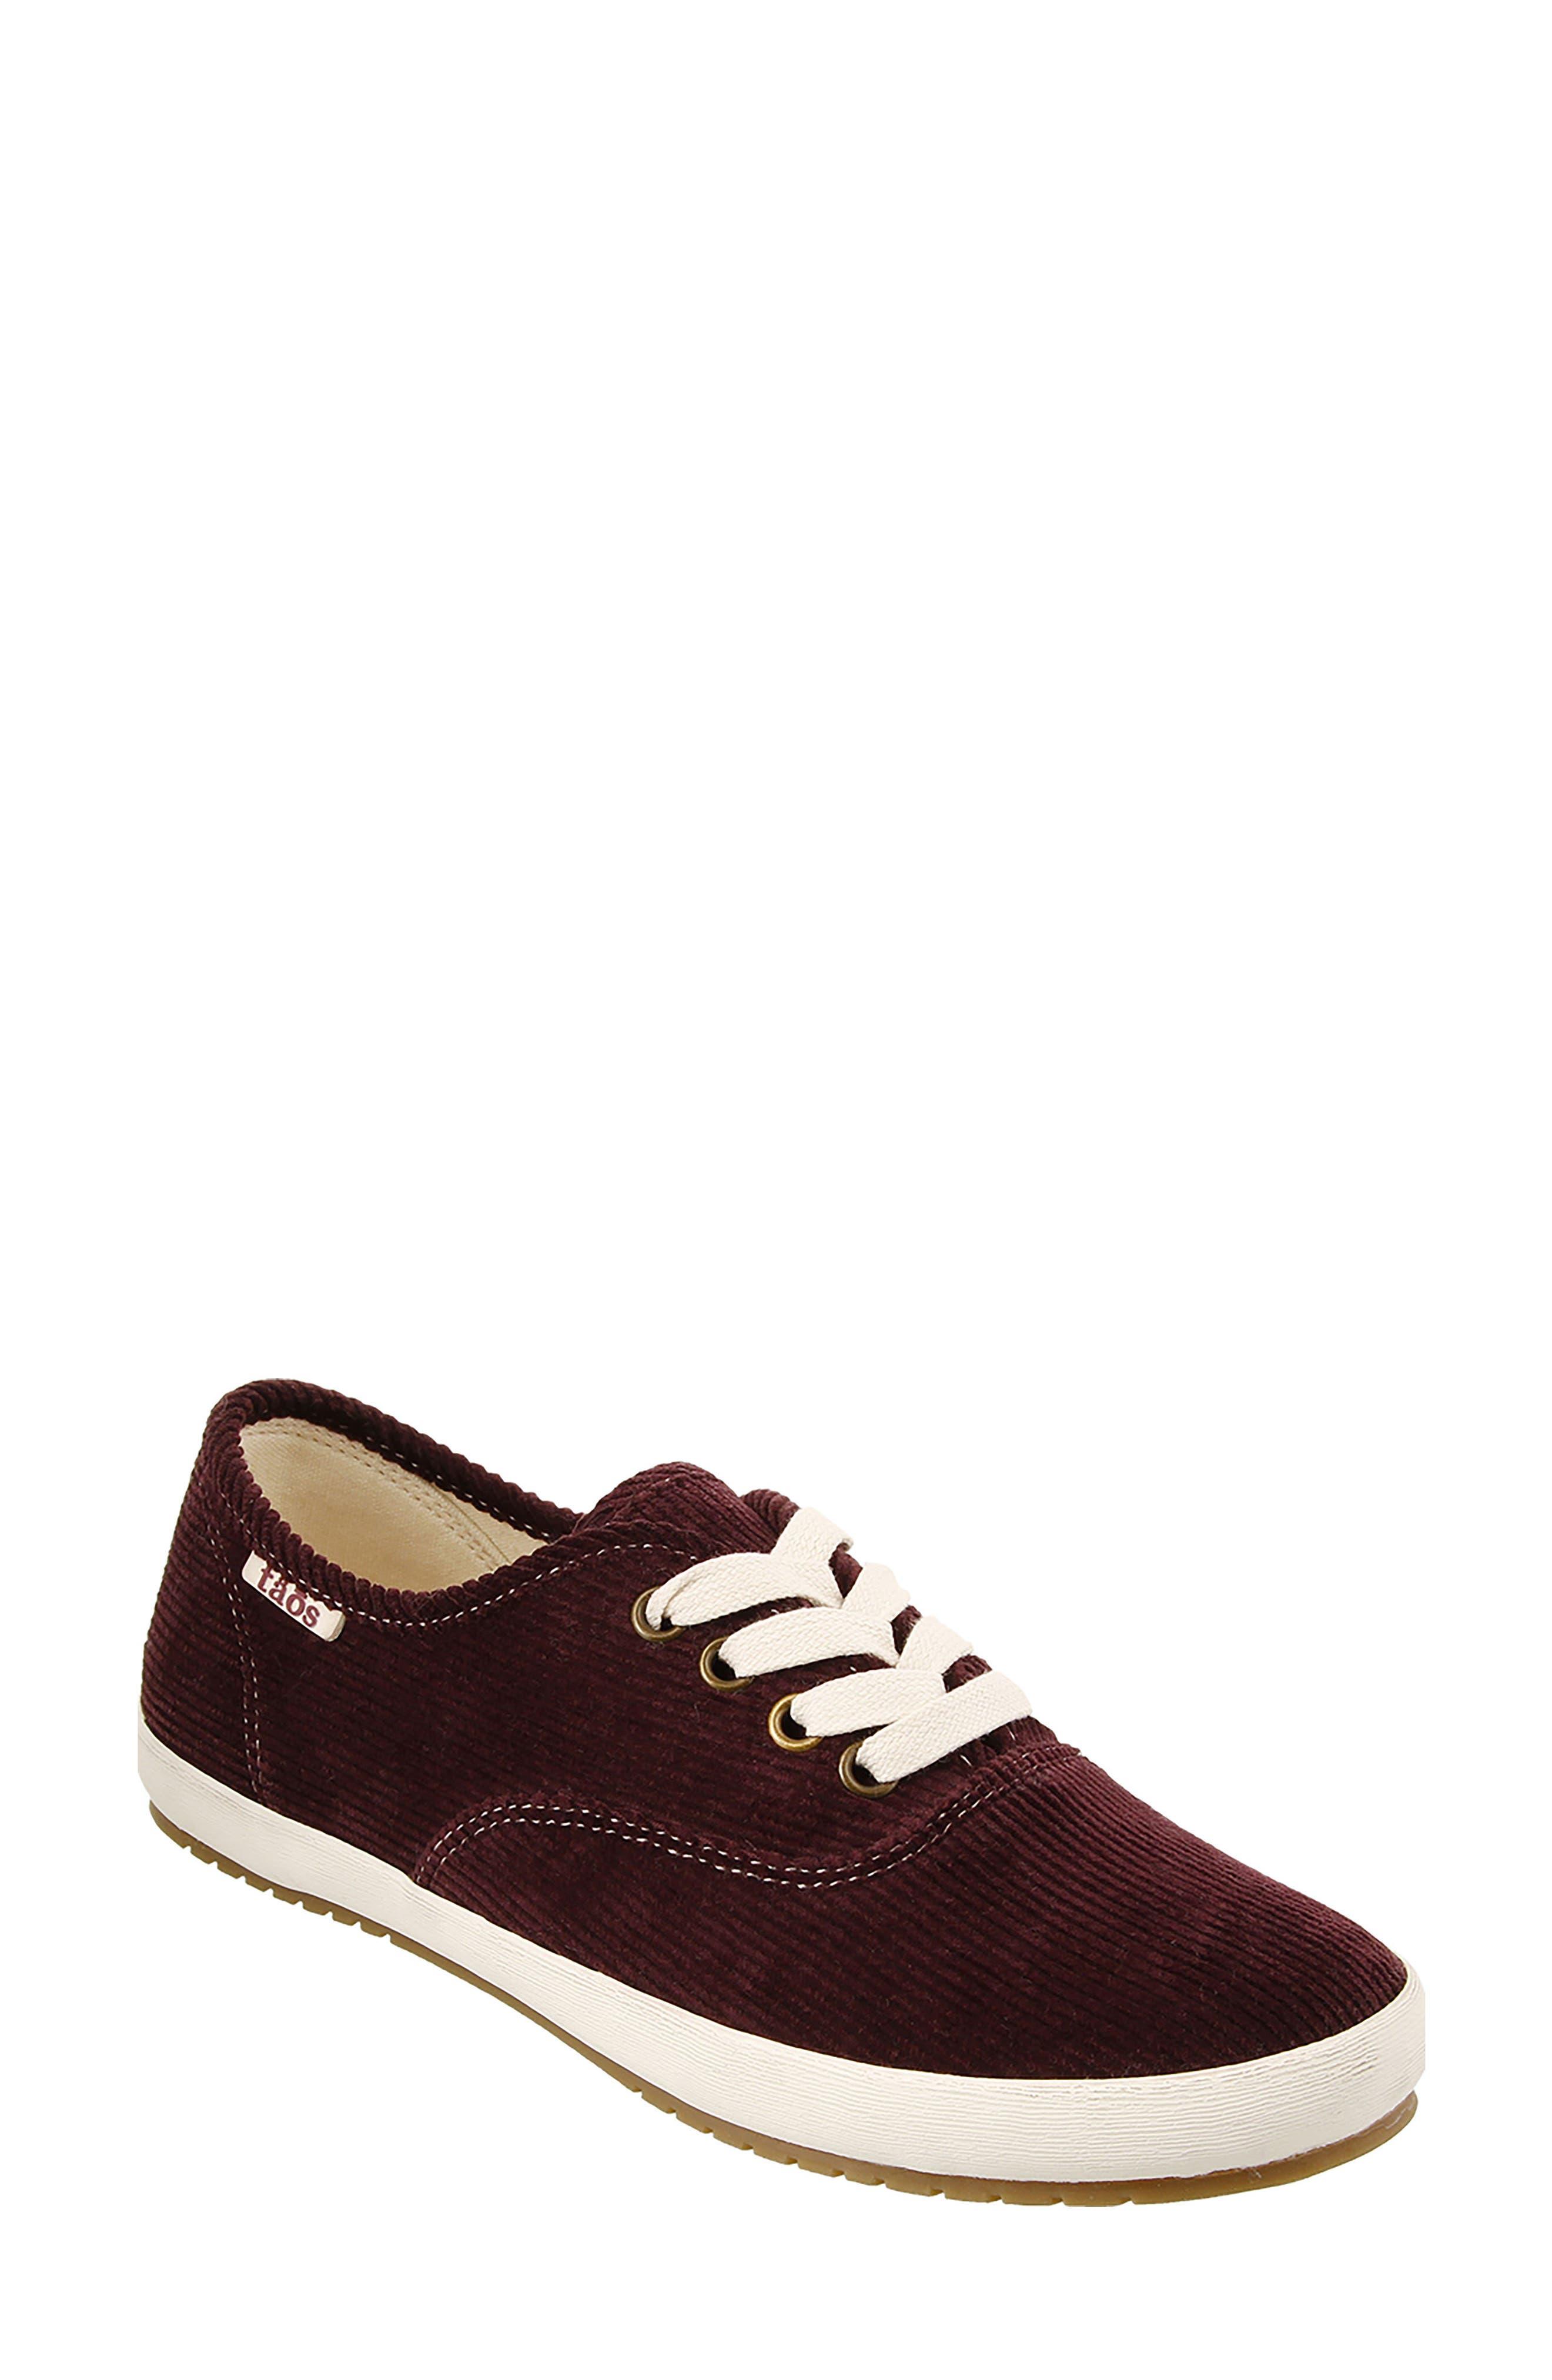 Guest Star Sneaker,                             Main thumbnail 1, color,                             Bordeaux Cord Fabric